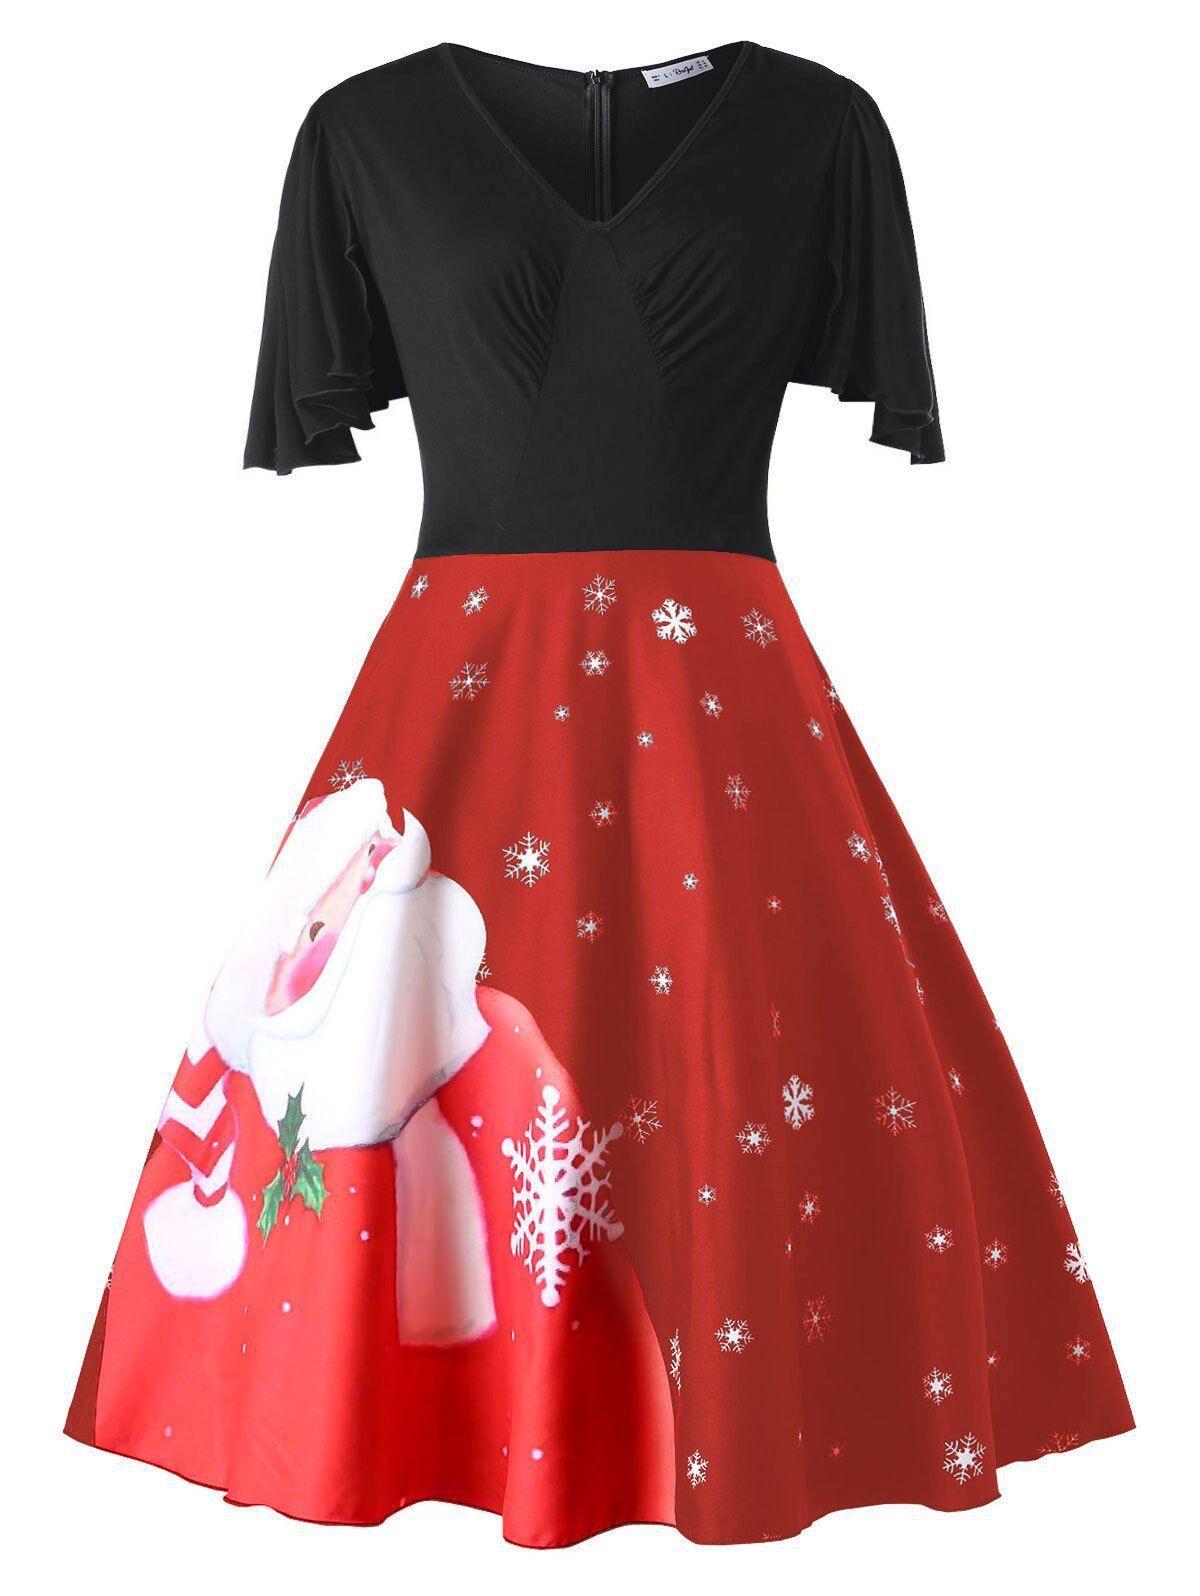 77e2929e551 Lady large Christmas dress women plus size panelled Christmas prints back  zipper v-neck petal sleeve party dress XL-5XL